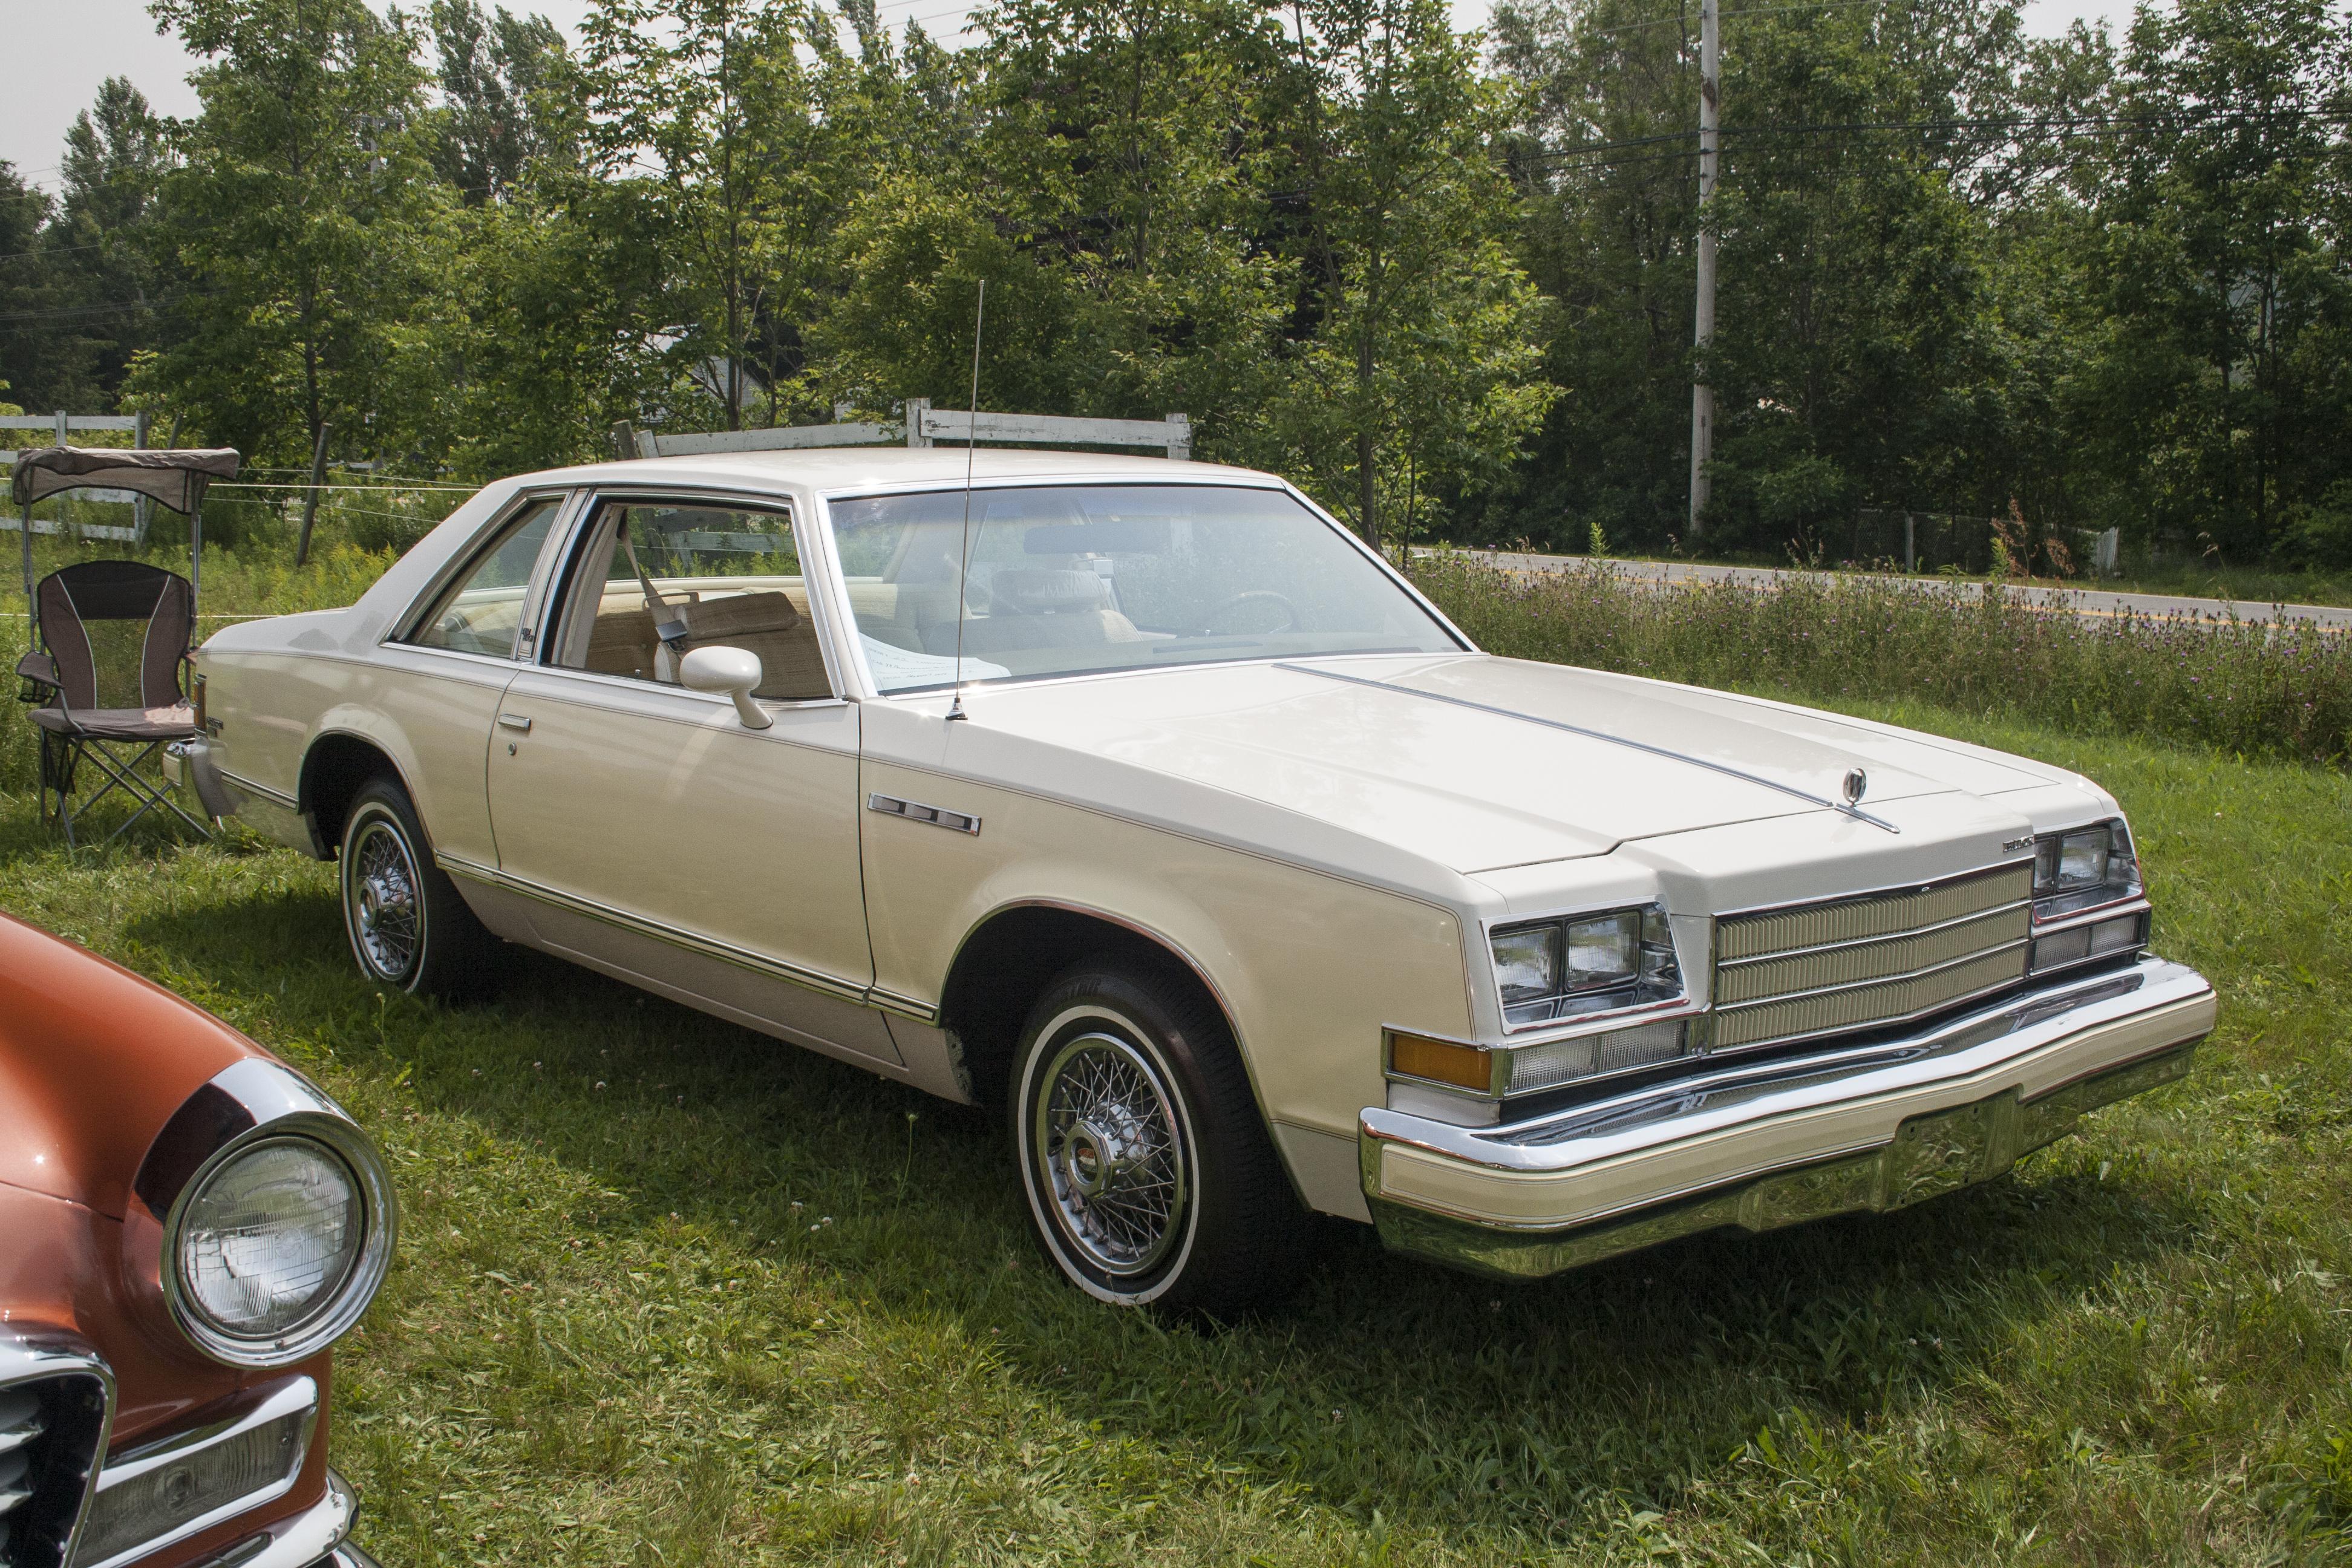 Buick LeSabre Pics, Vehicles Collection